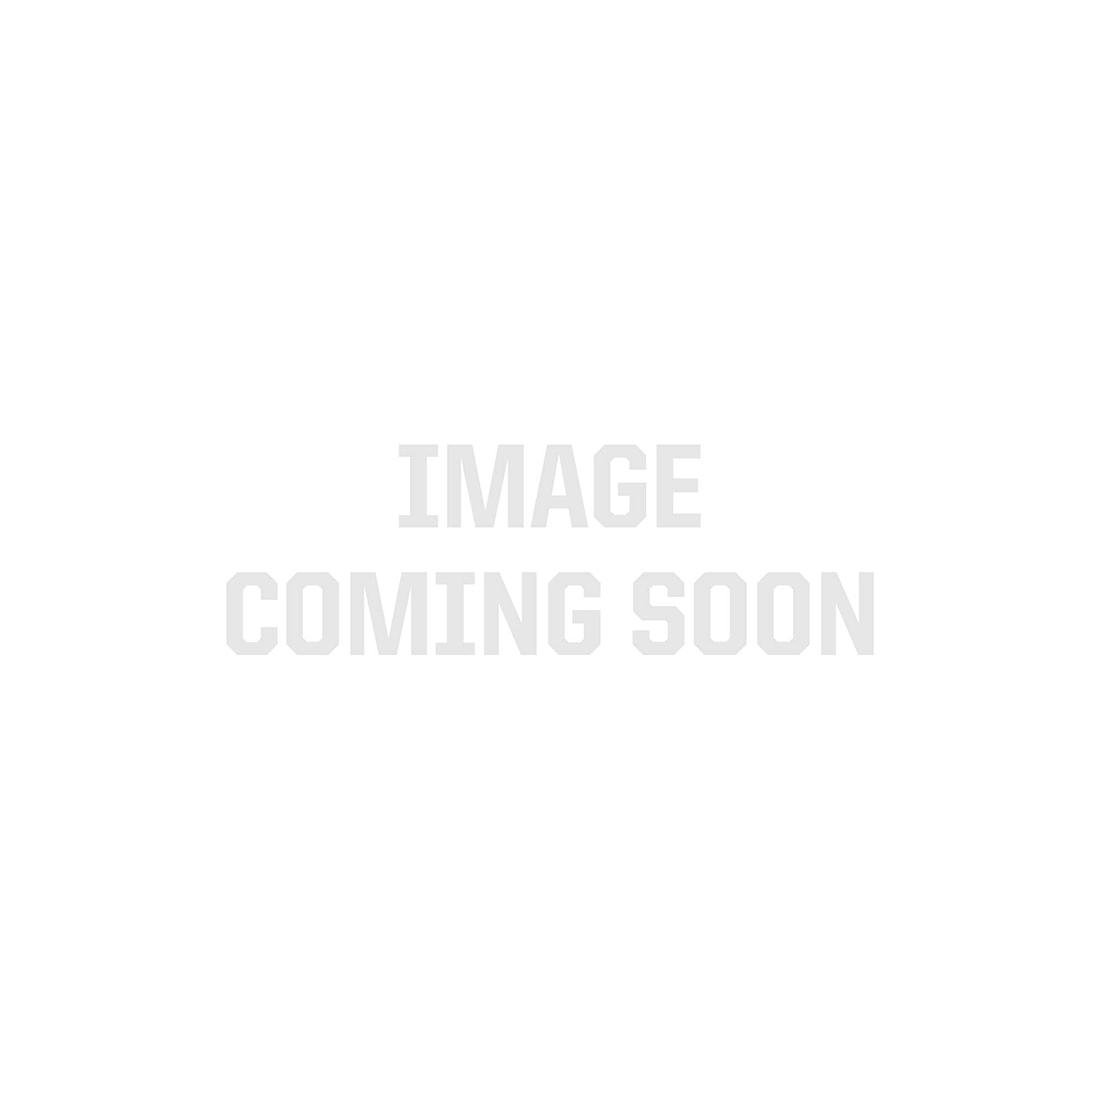 Soft White 2835 Single Row CurrentControl LED Strip Light, 60/m, 10mm wide, Sample Kit